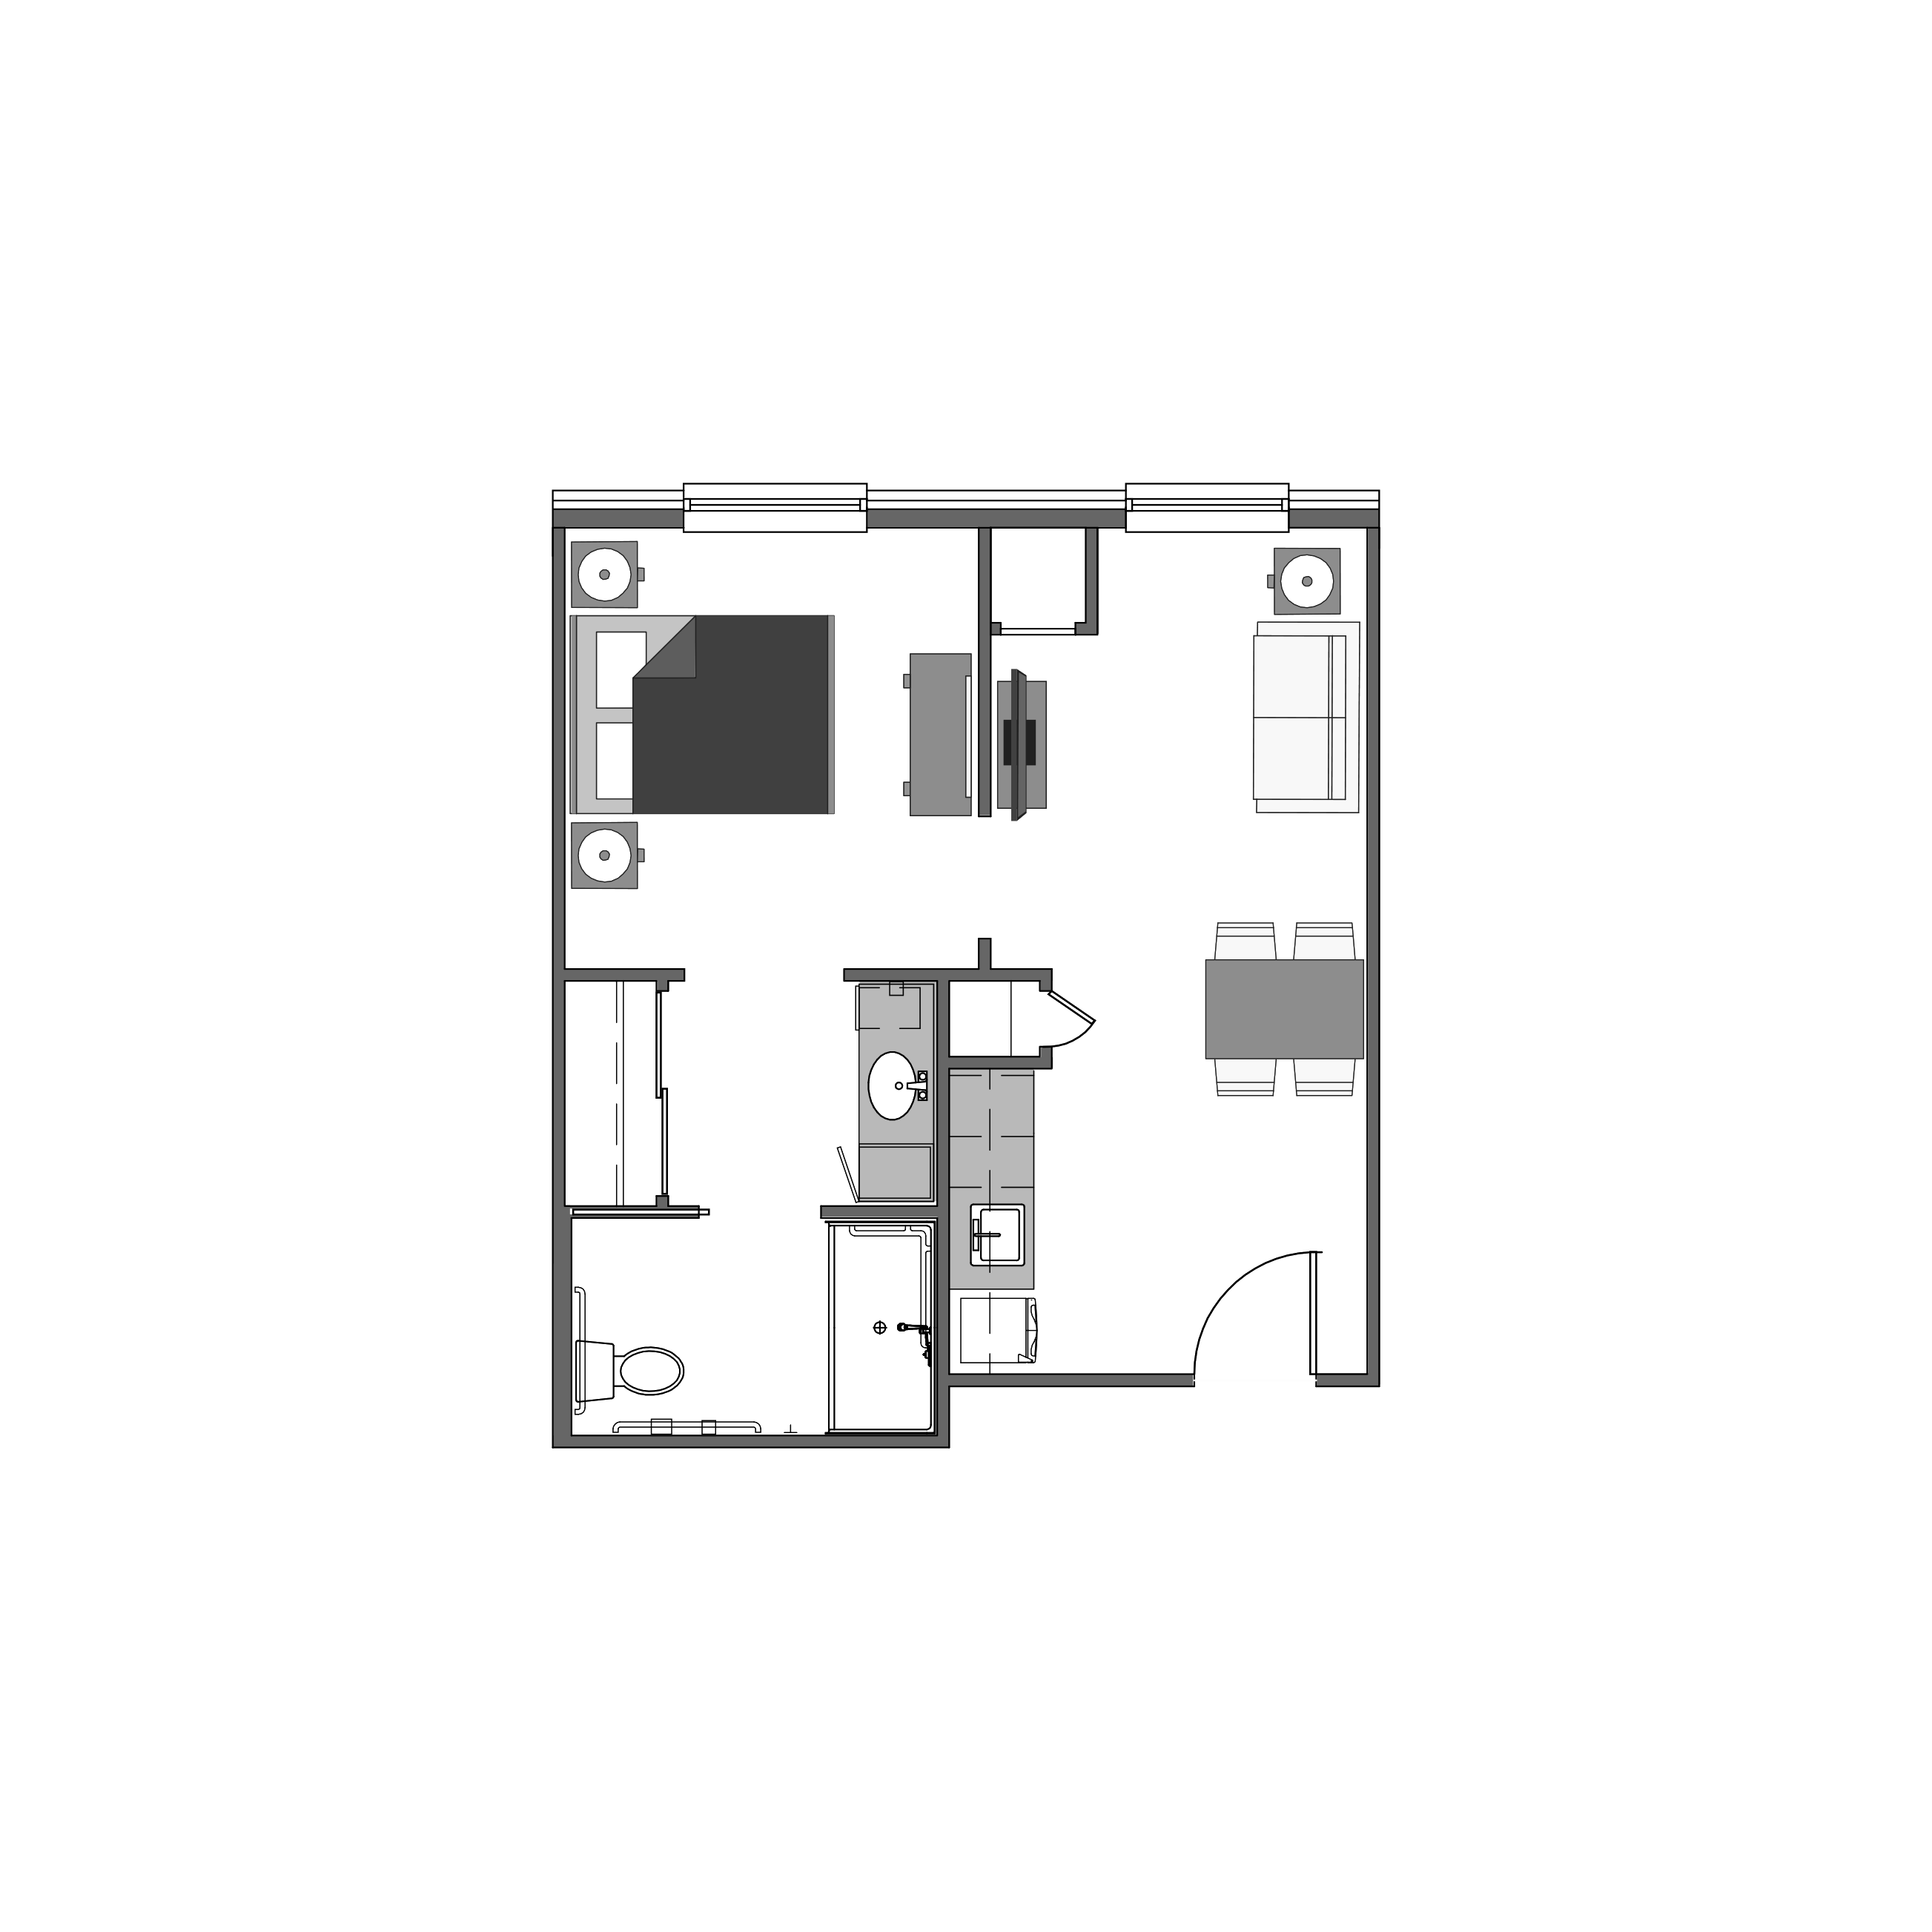 One bedroom floor plan, 441 square feet